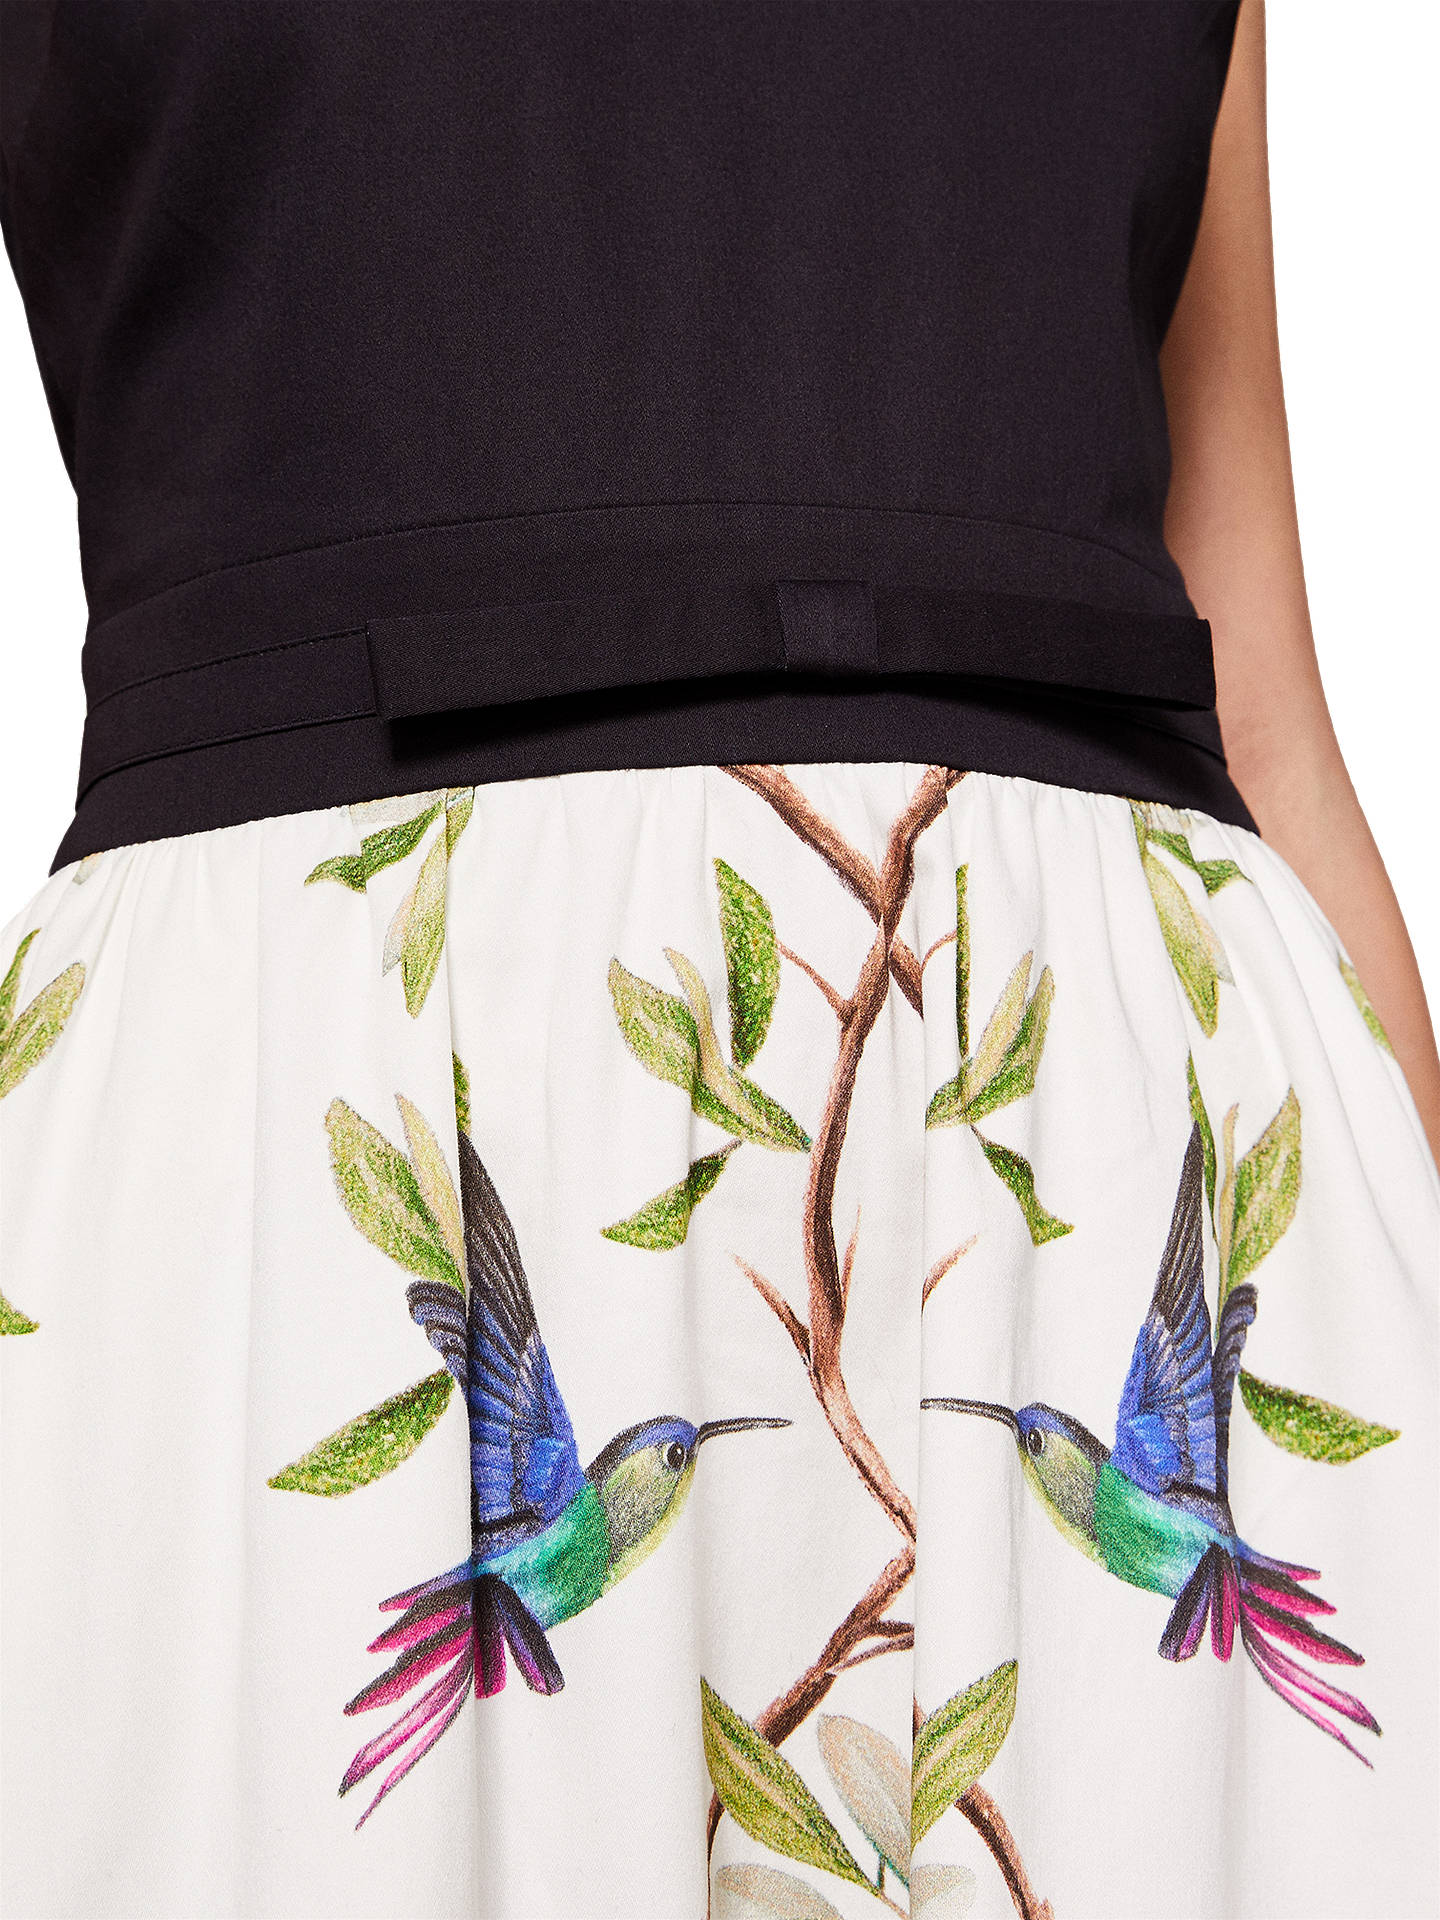 New Ted Baker Reice Highgrove V-neck Cotton Dress Sz 3,4,5